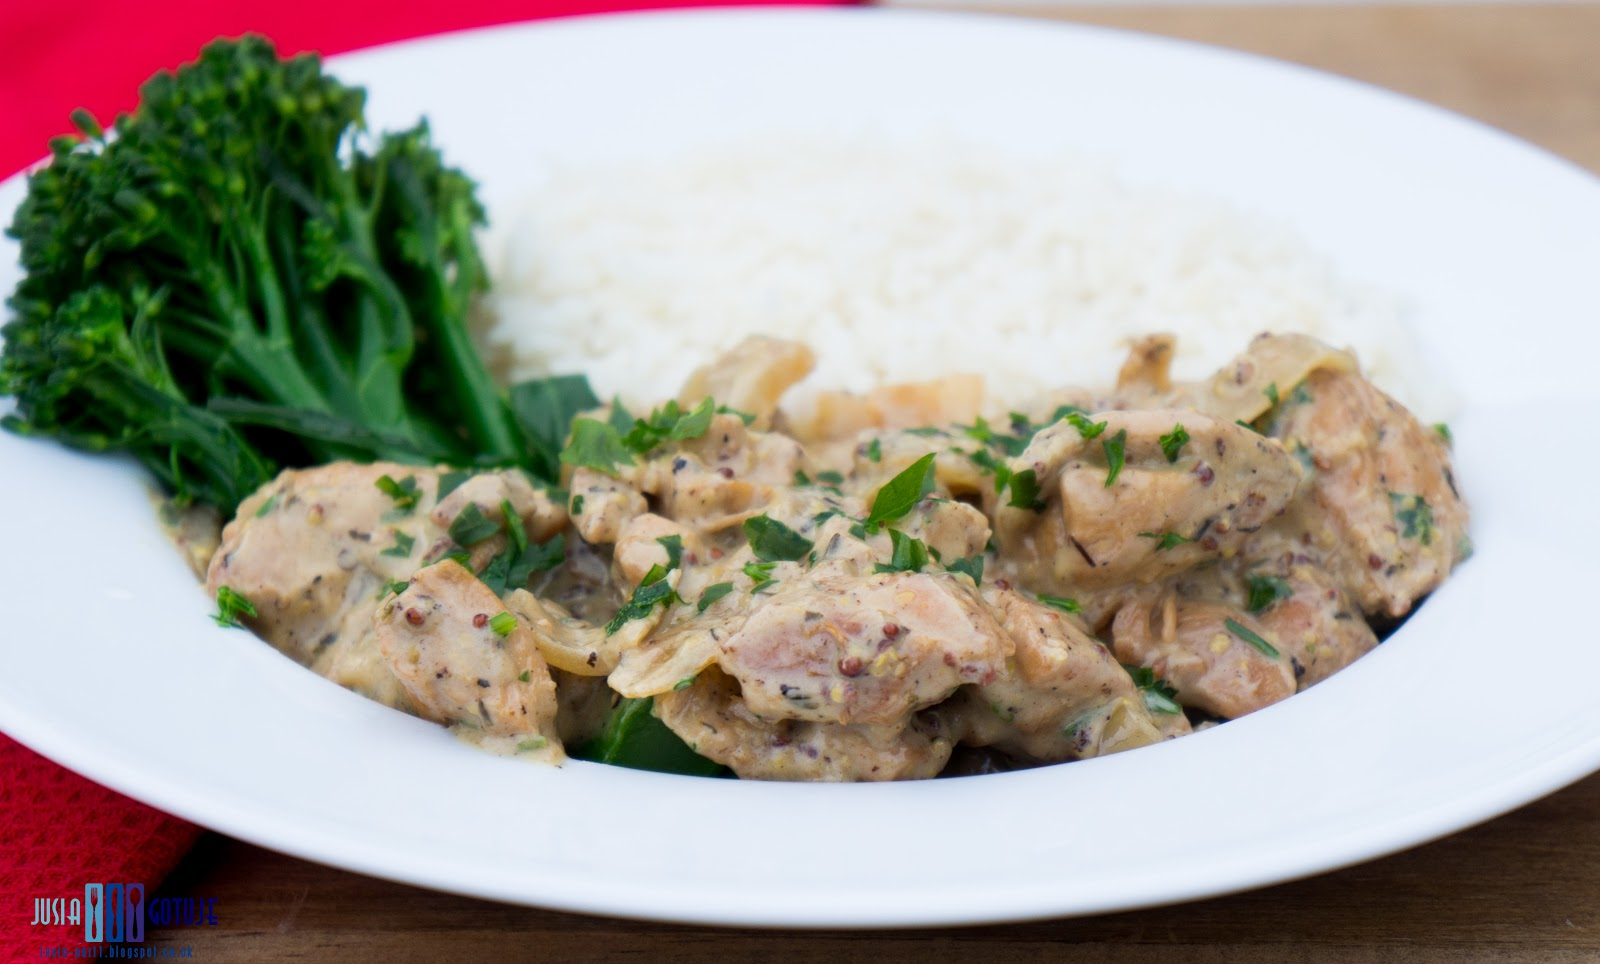 Kurczak, cider, cydr, sos, kurczak w sosie, drób, szybki obiad, chicken, chicken in cider sauce, quick dinner,